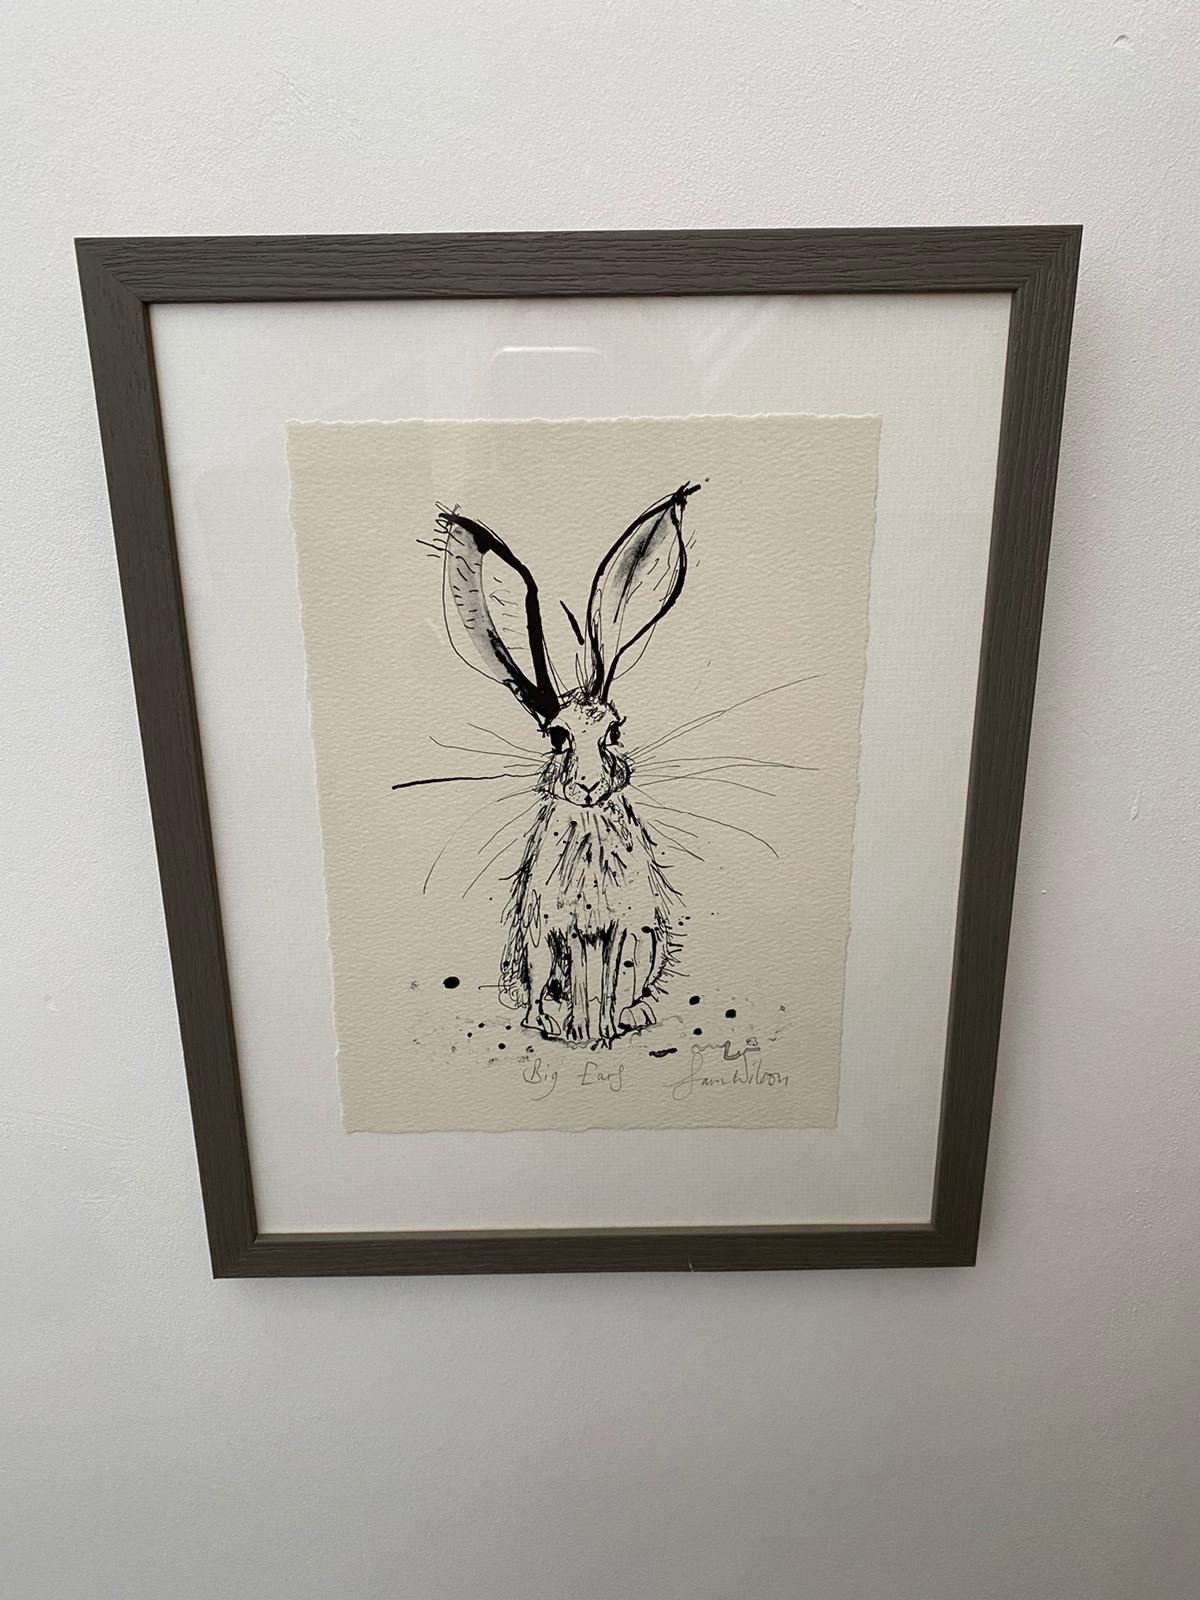 Sam Wilson Illustrations - Big Ears